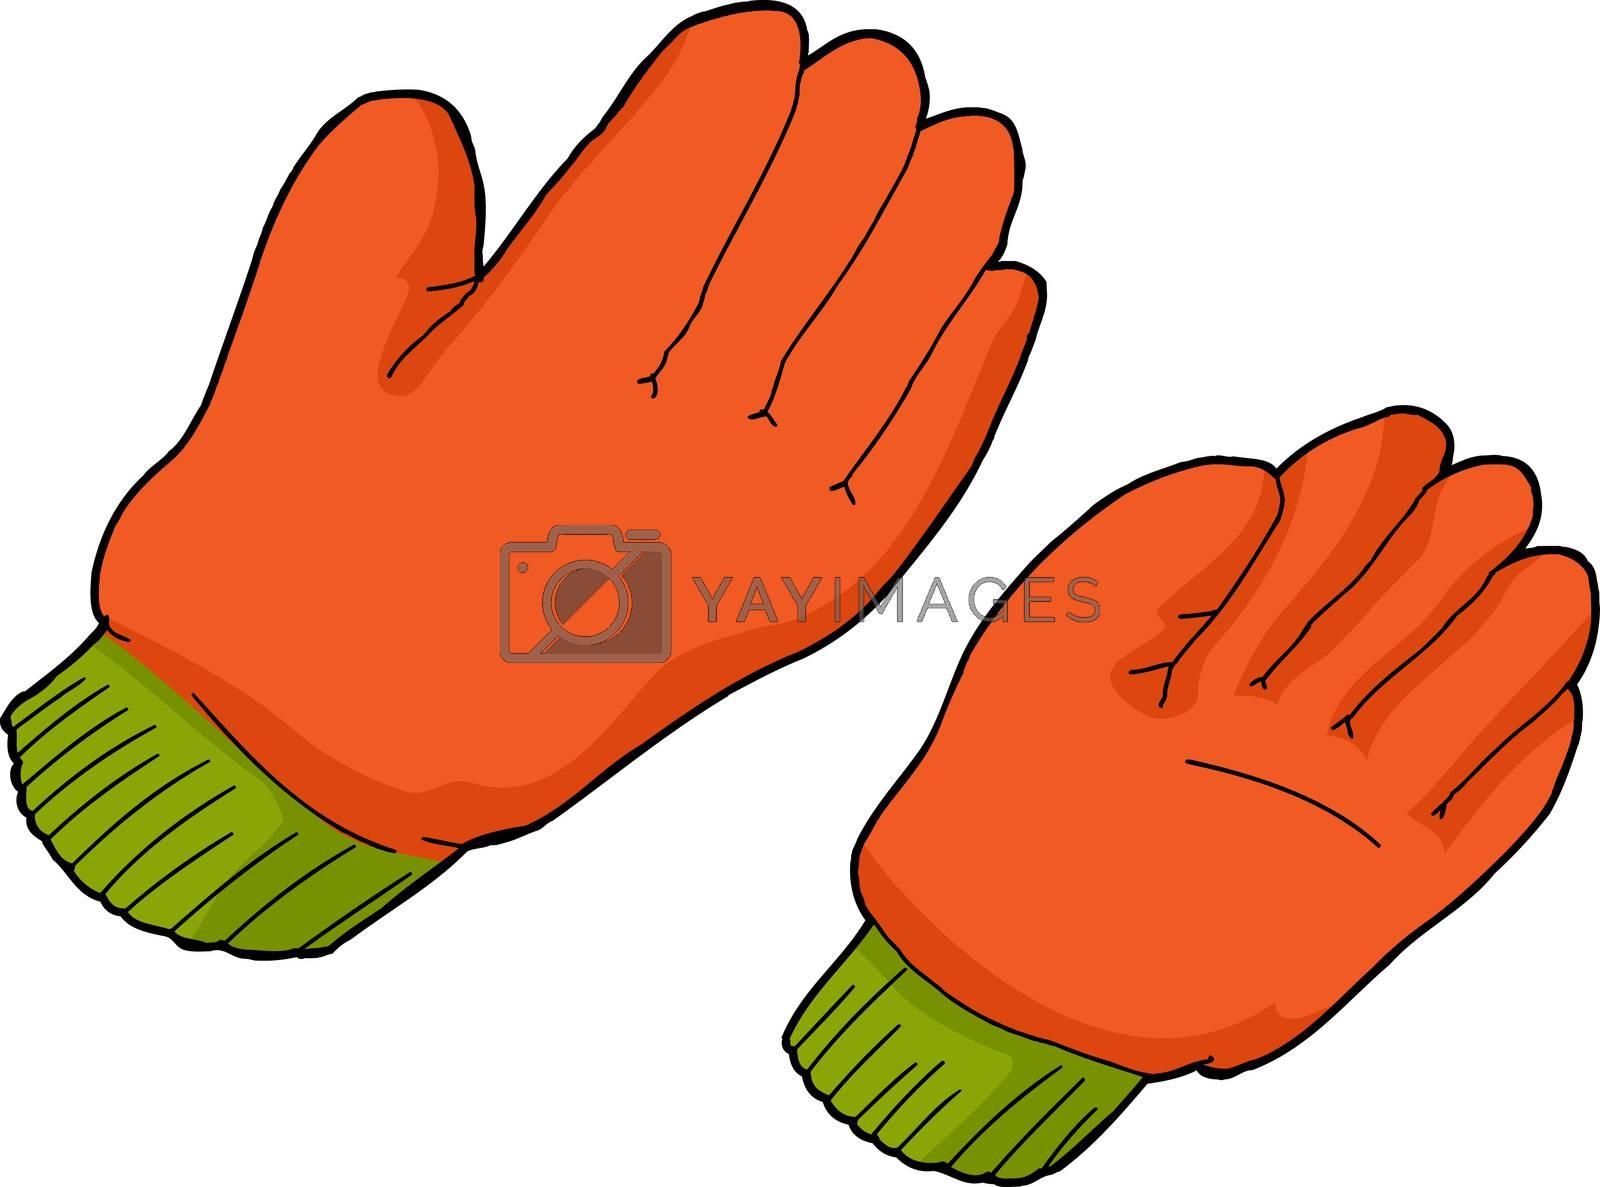 Royalty free image of Orange Work Gloves by TheBlackRhino